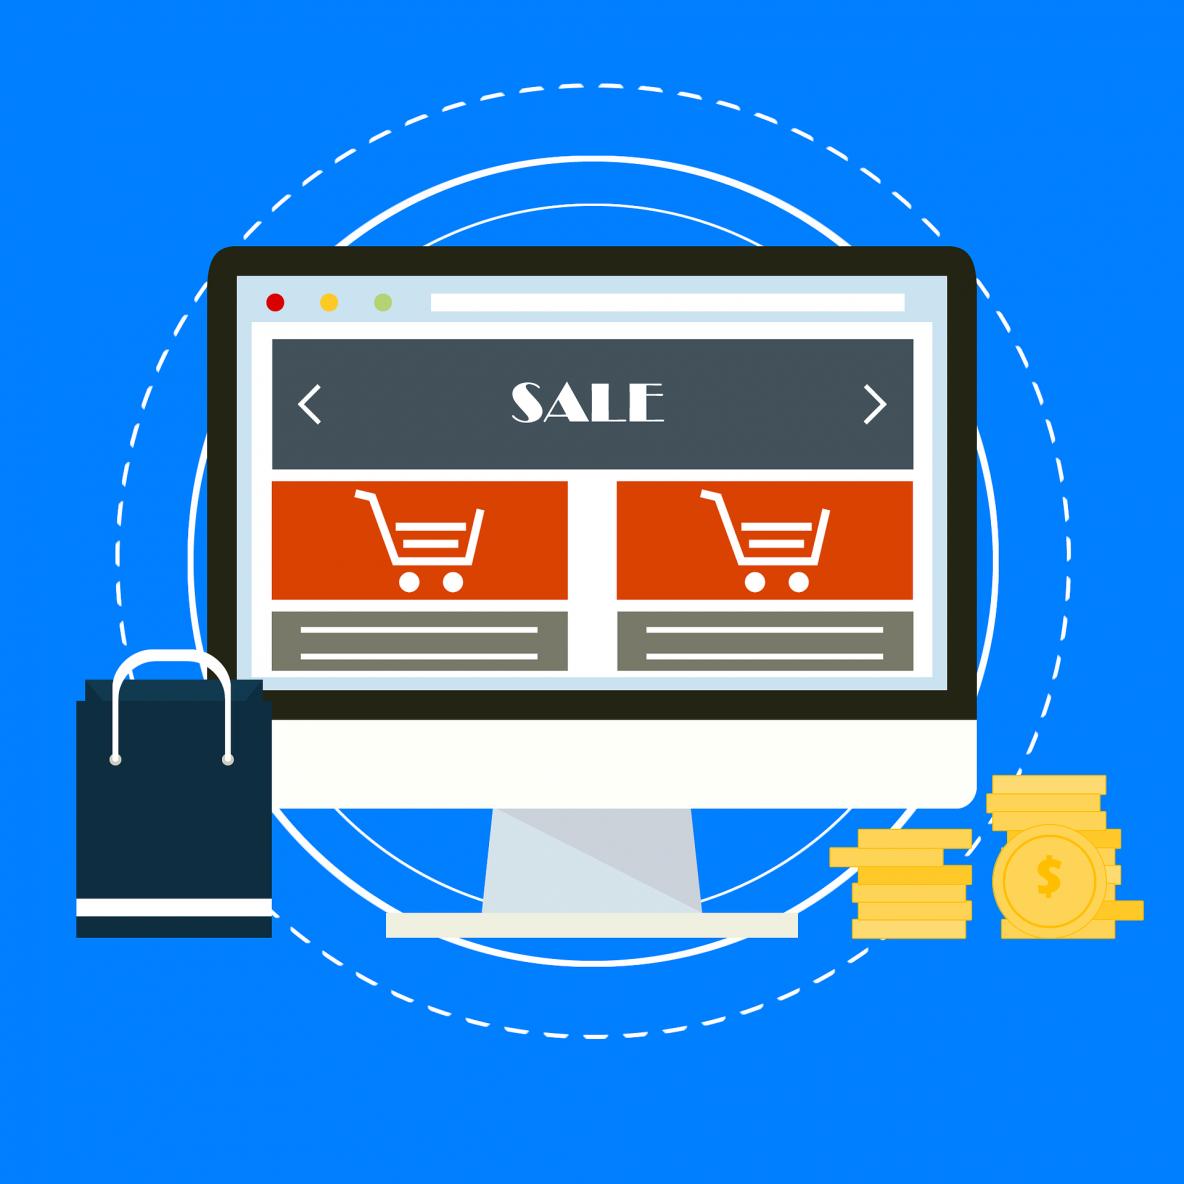 E-commerce live 2019